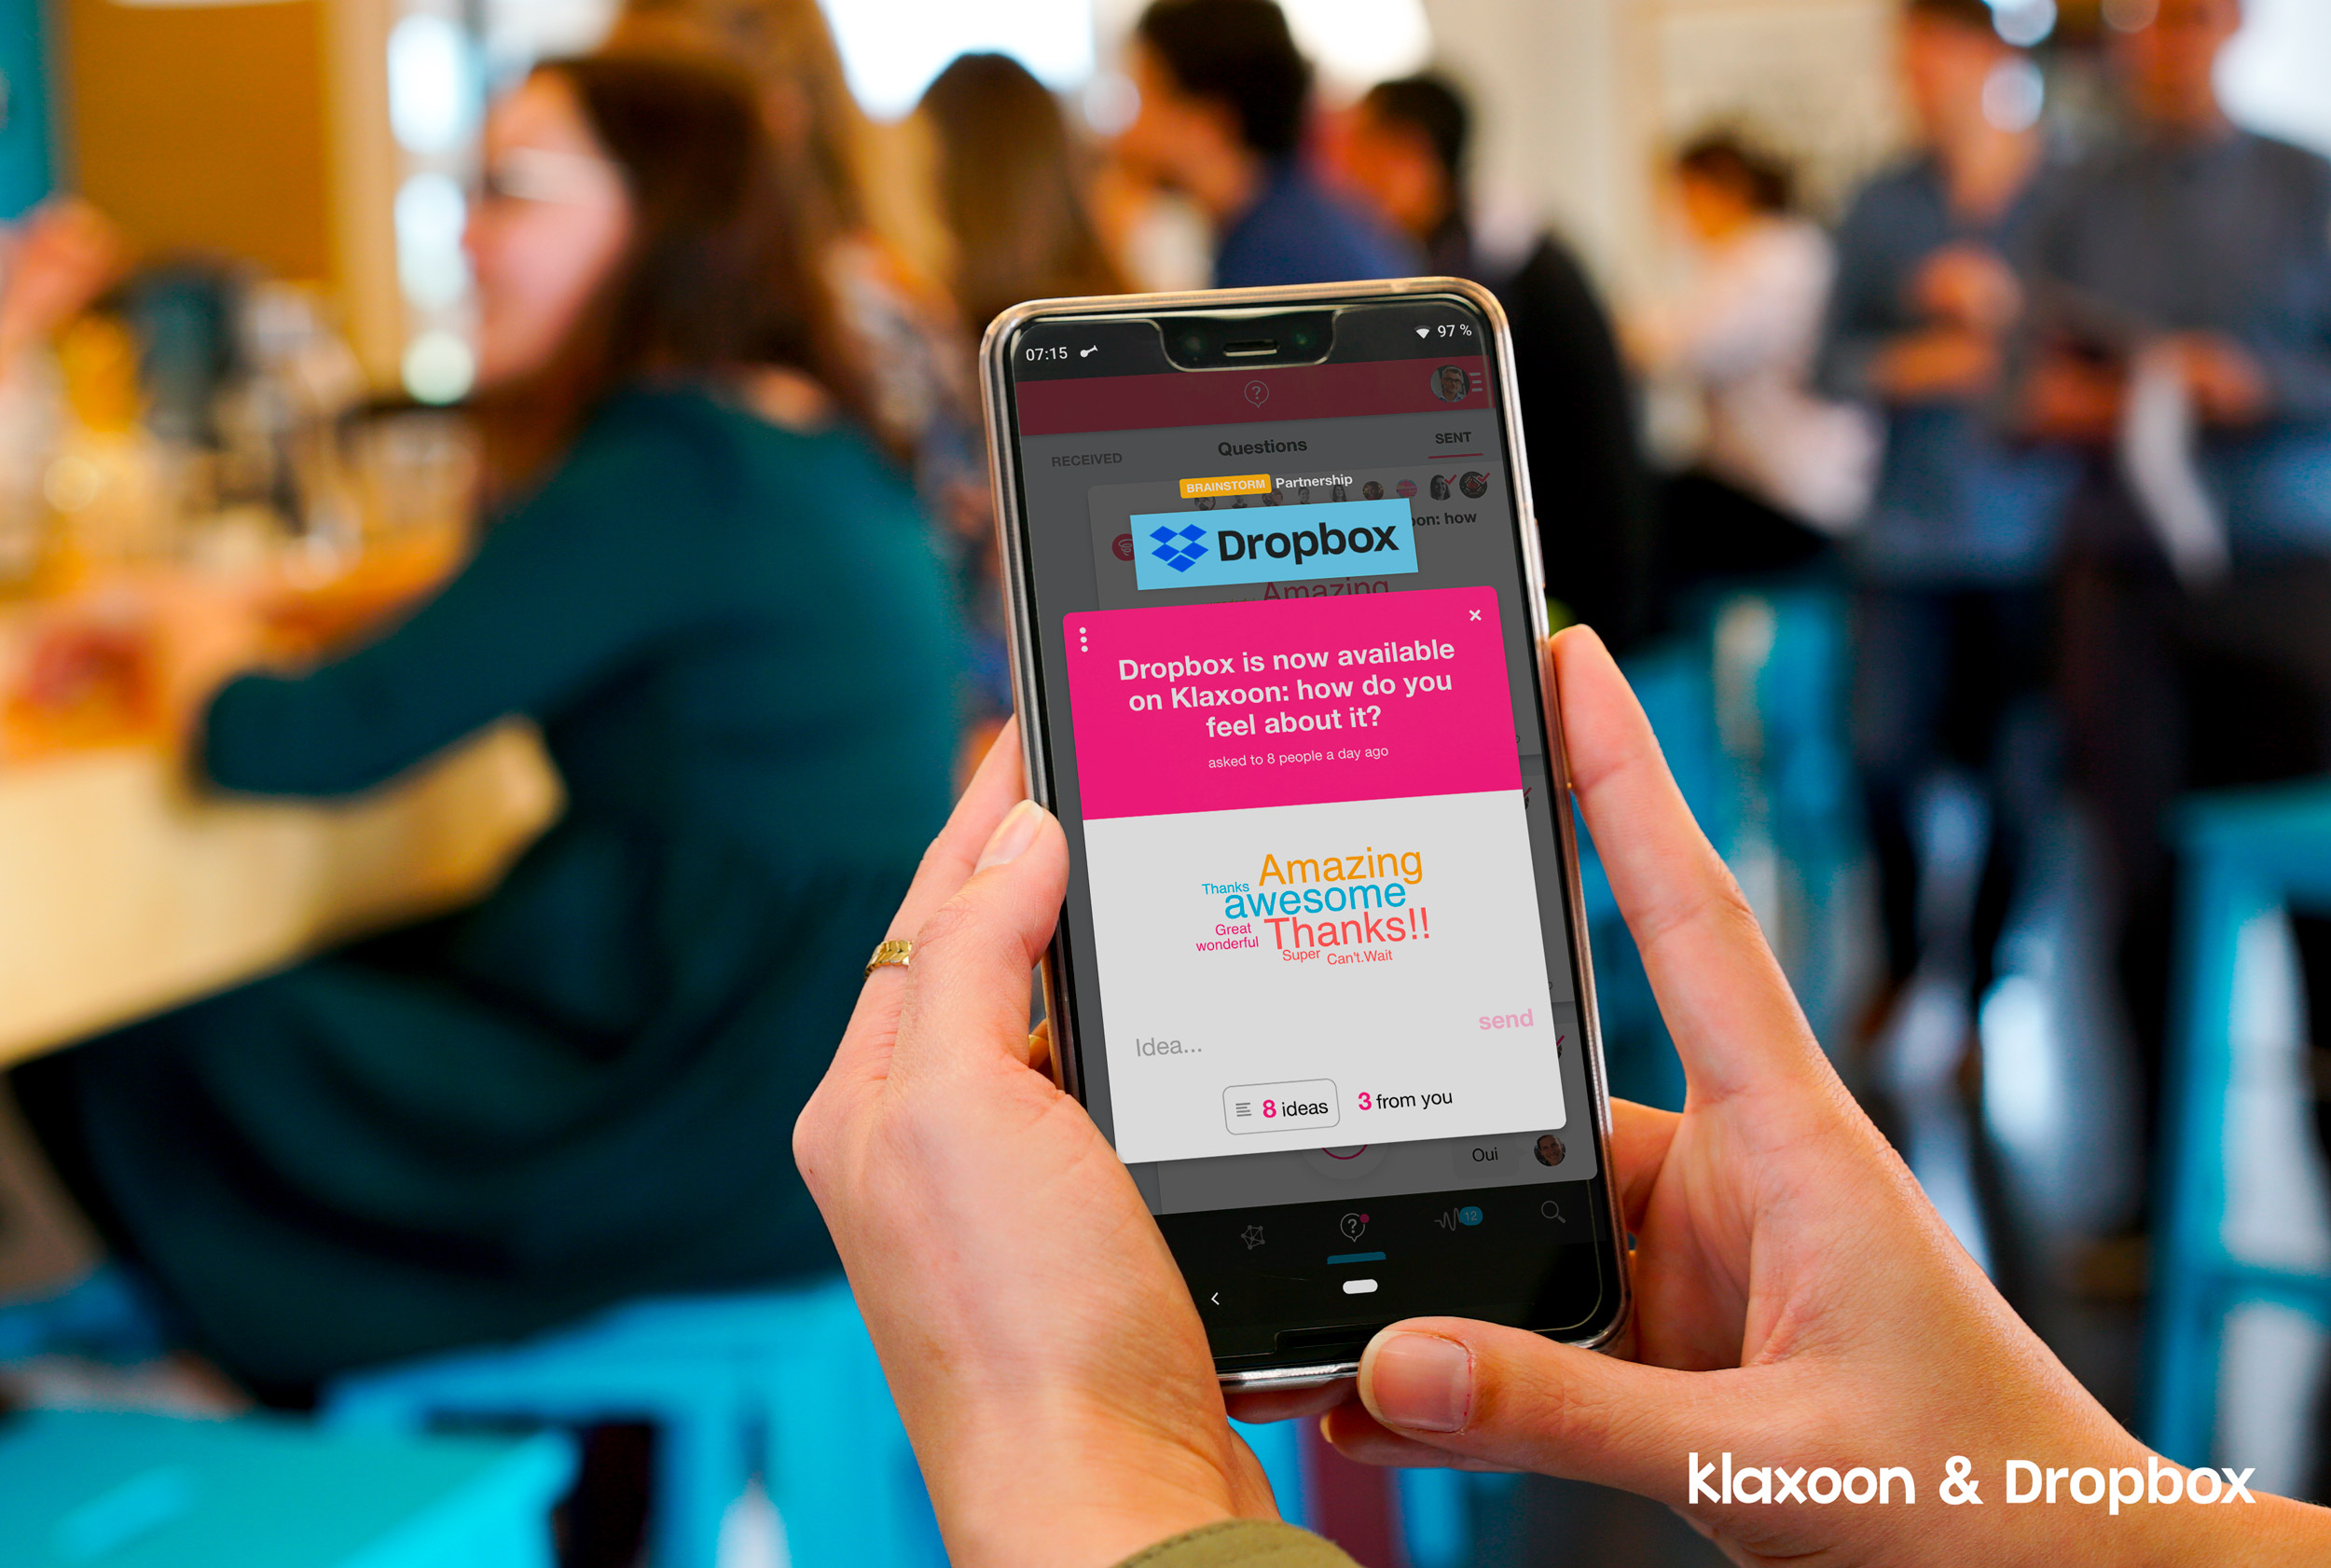 Klaxoon and Dropbox launch a new partnership